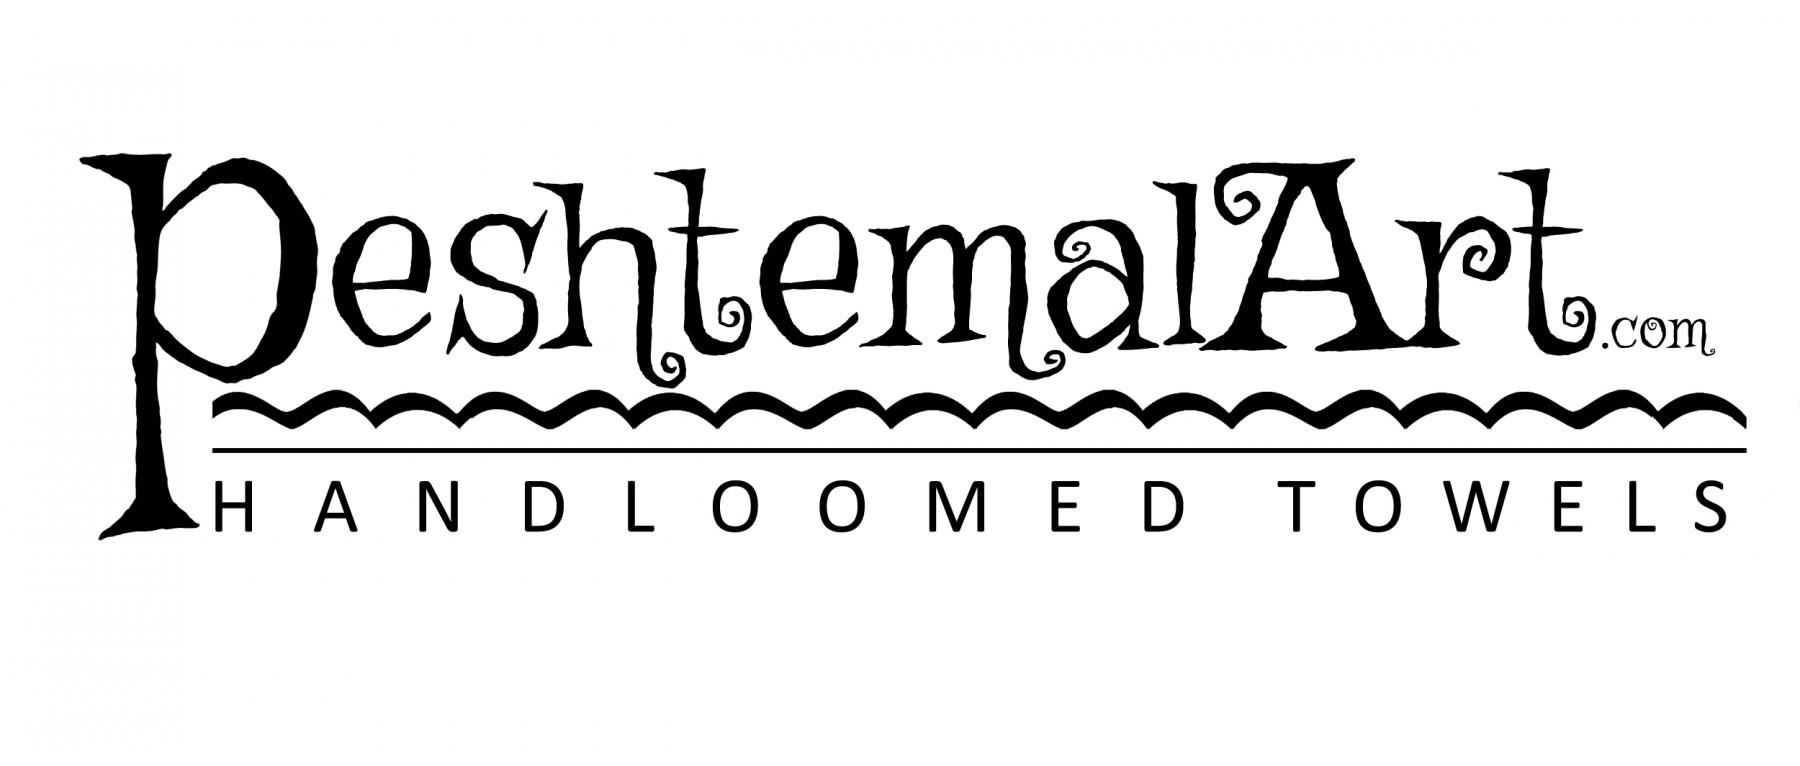 PeshtemalArt Logo